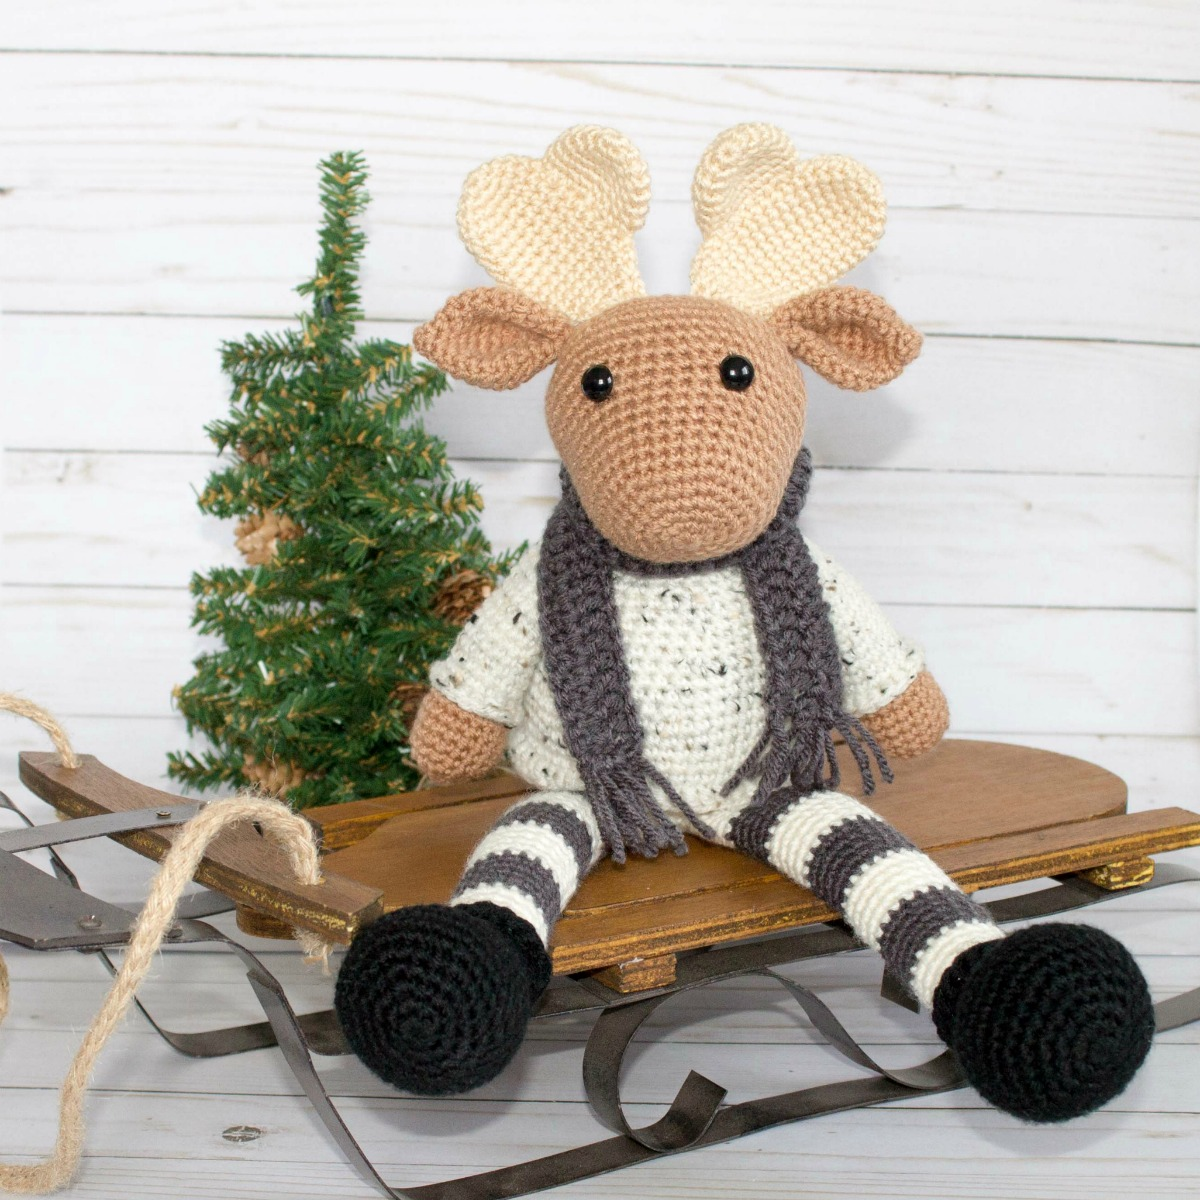 Free Crochet Moose And Crochet Reindeer Pattern Thefriendlyredfox